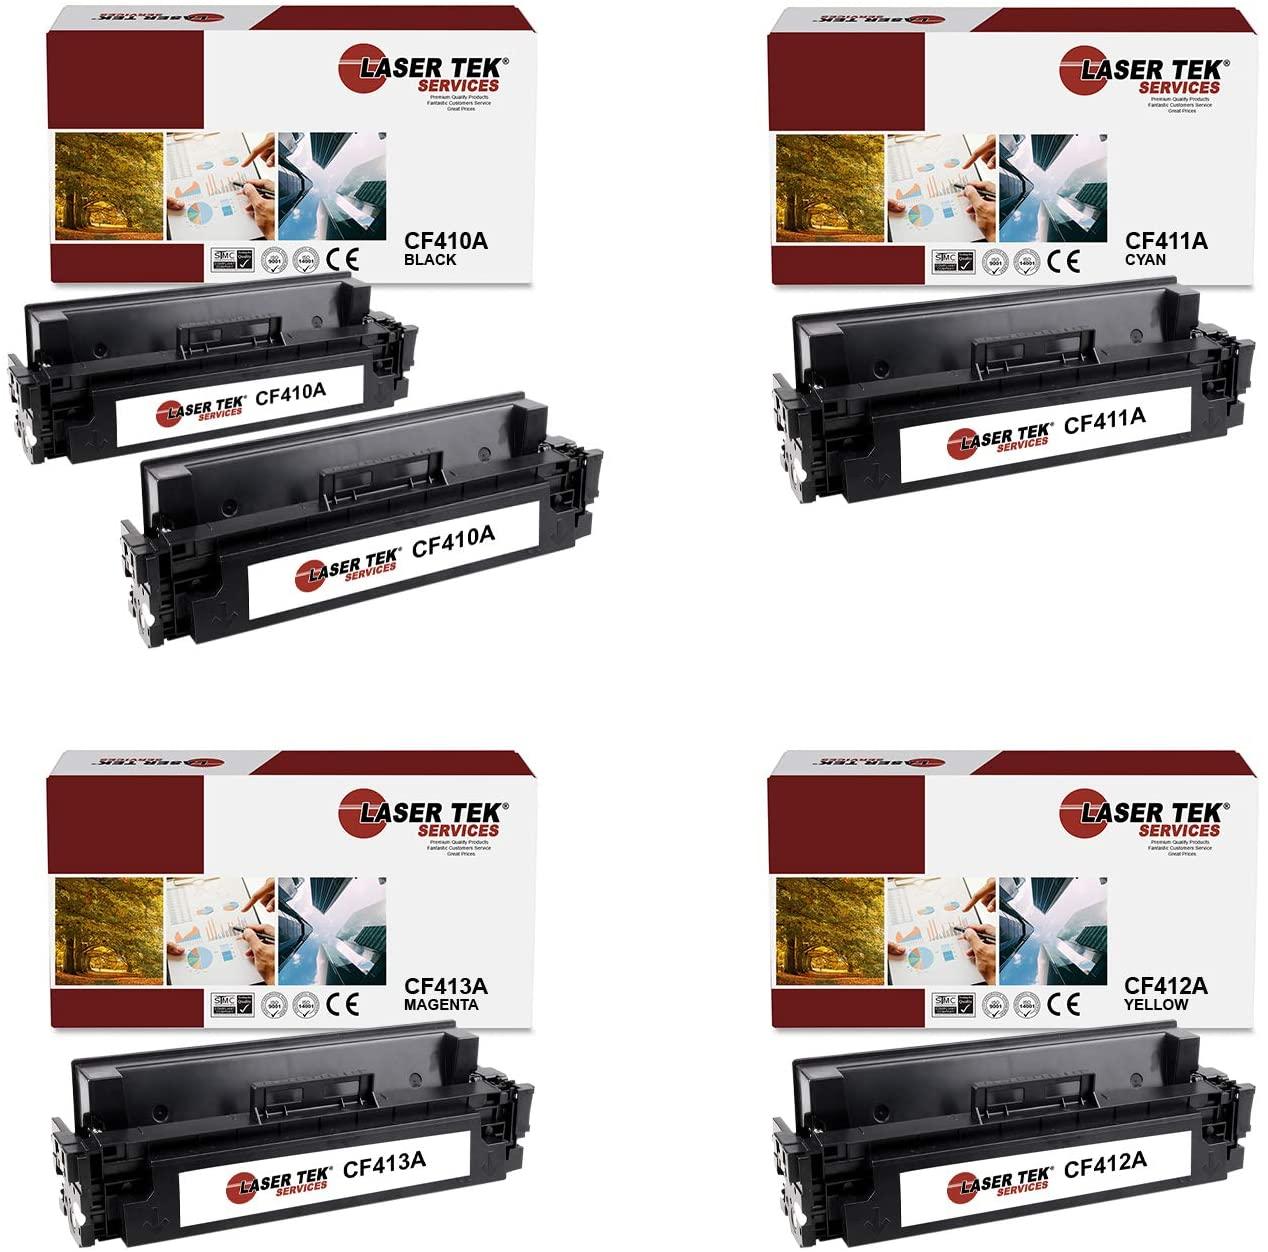 Laser Tek Services Compatible HP 410A CF410A CF411A CF412A CF413A Toner Cartridge Replacement for HP Laserjet Pro M452dn M452dw, MFP M477fdn Printers (Black, Cyan, Magenta, Yellow, 5 Pack)